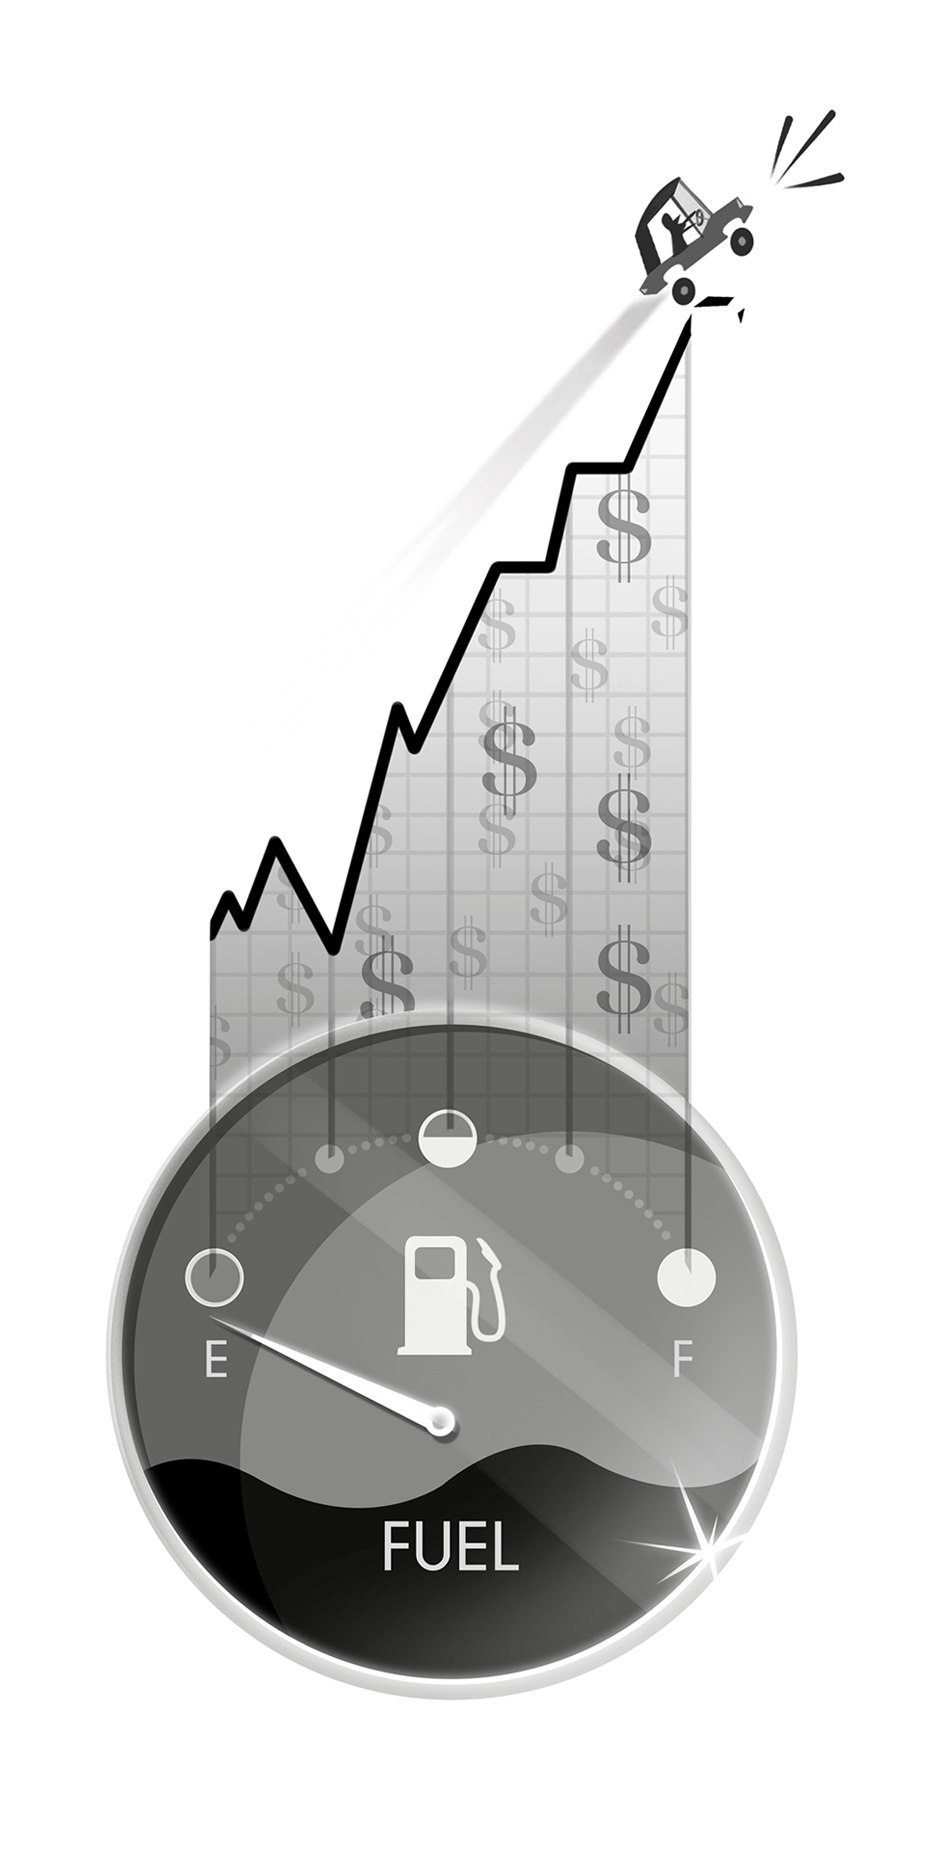 Fuel Prices - Spot Designs